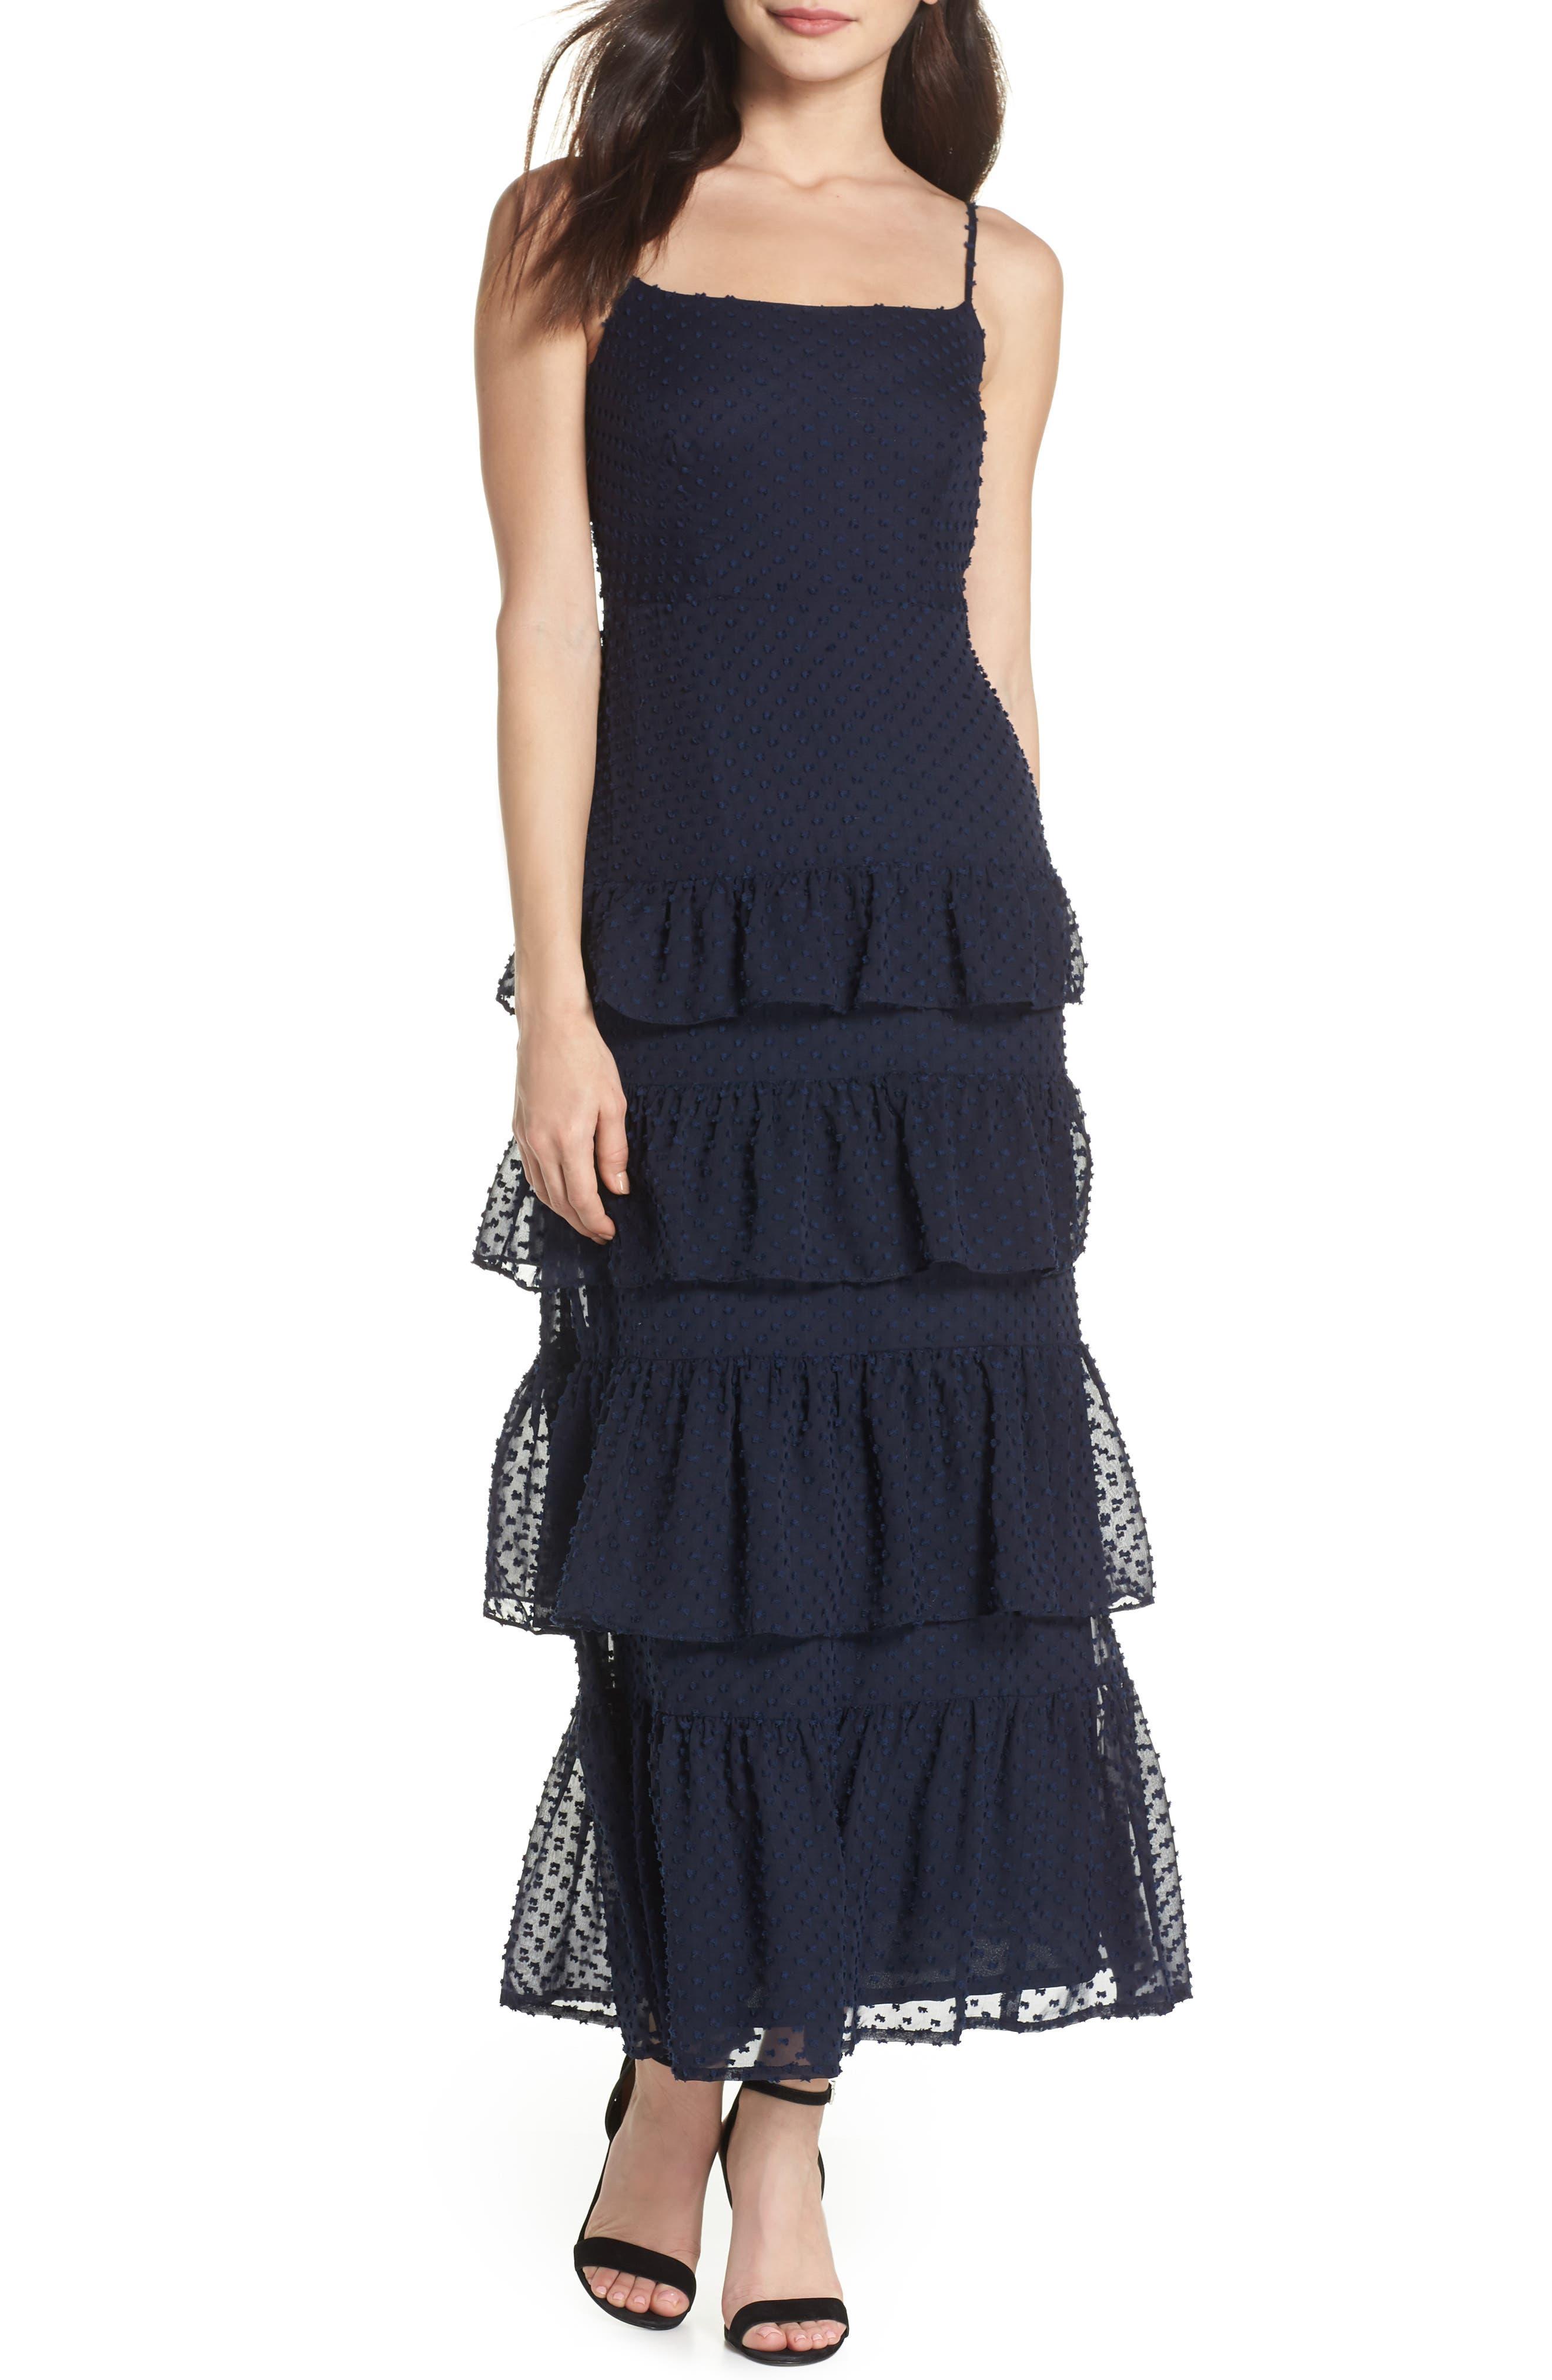 J.Crew Dabble Dress (Nordstrom Exclusive)